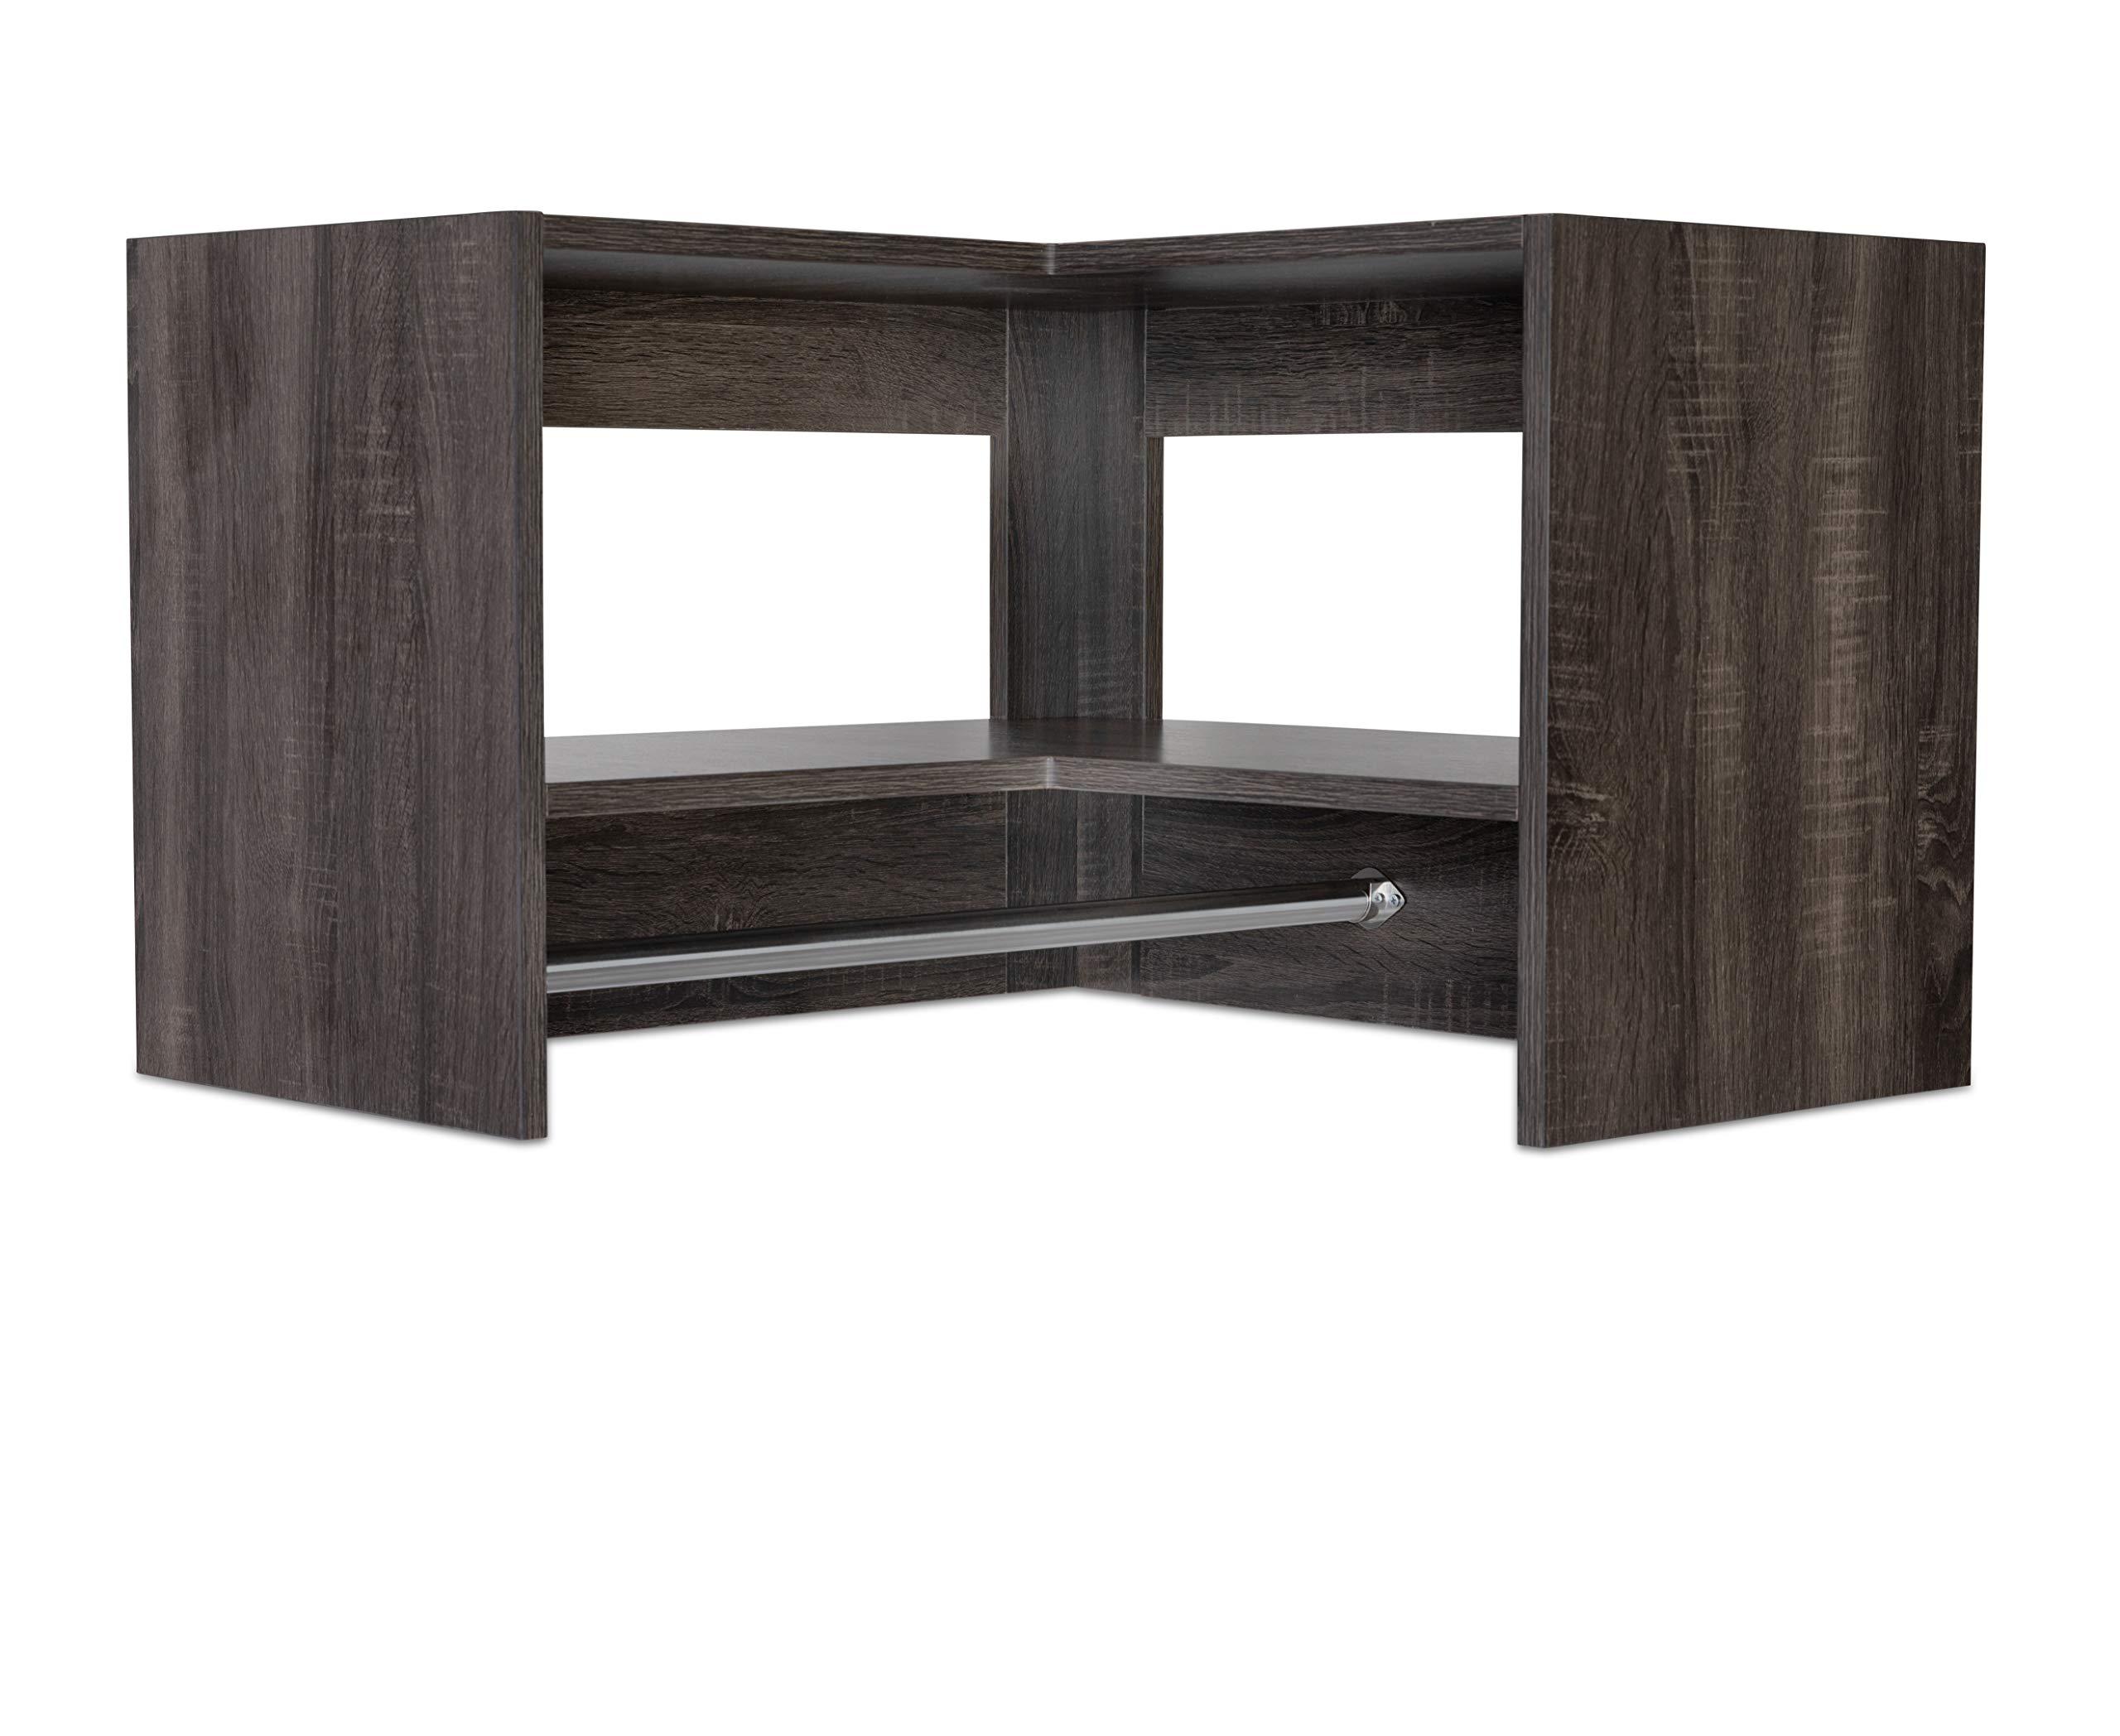 Modular Closets Corner Tall Hanging Wood Closet Organizer (Driftwood Grey)